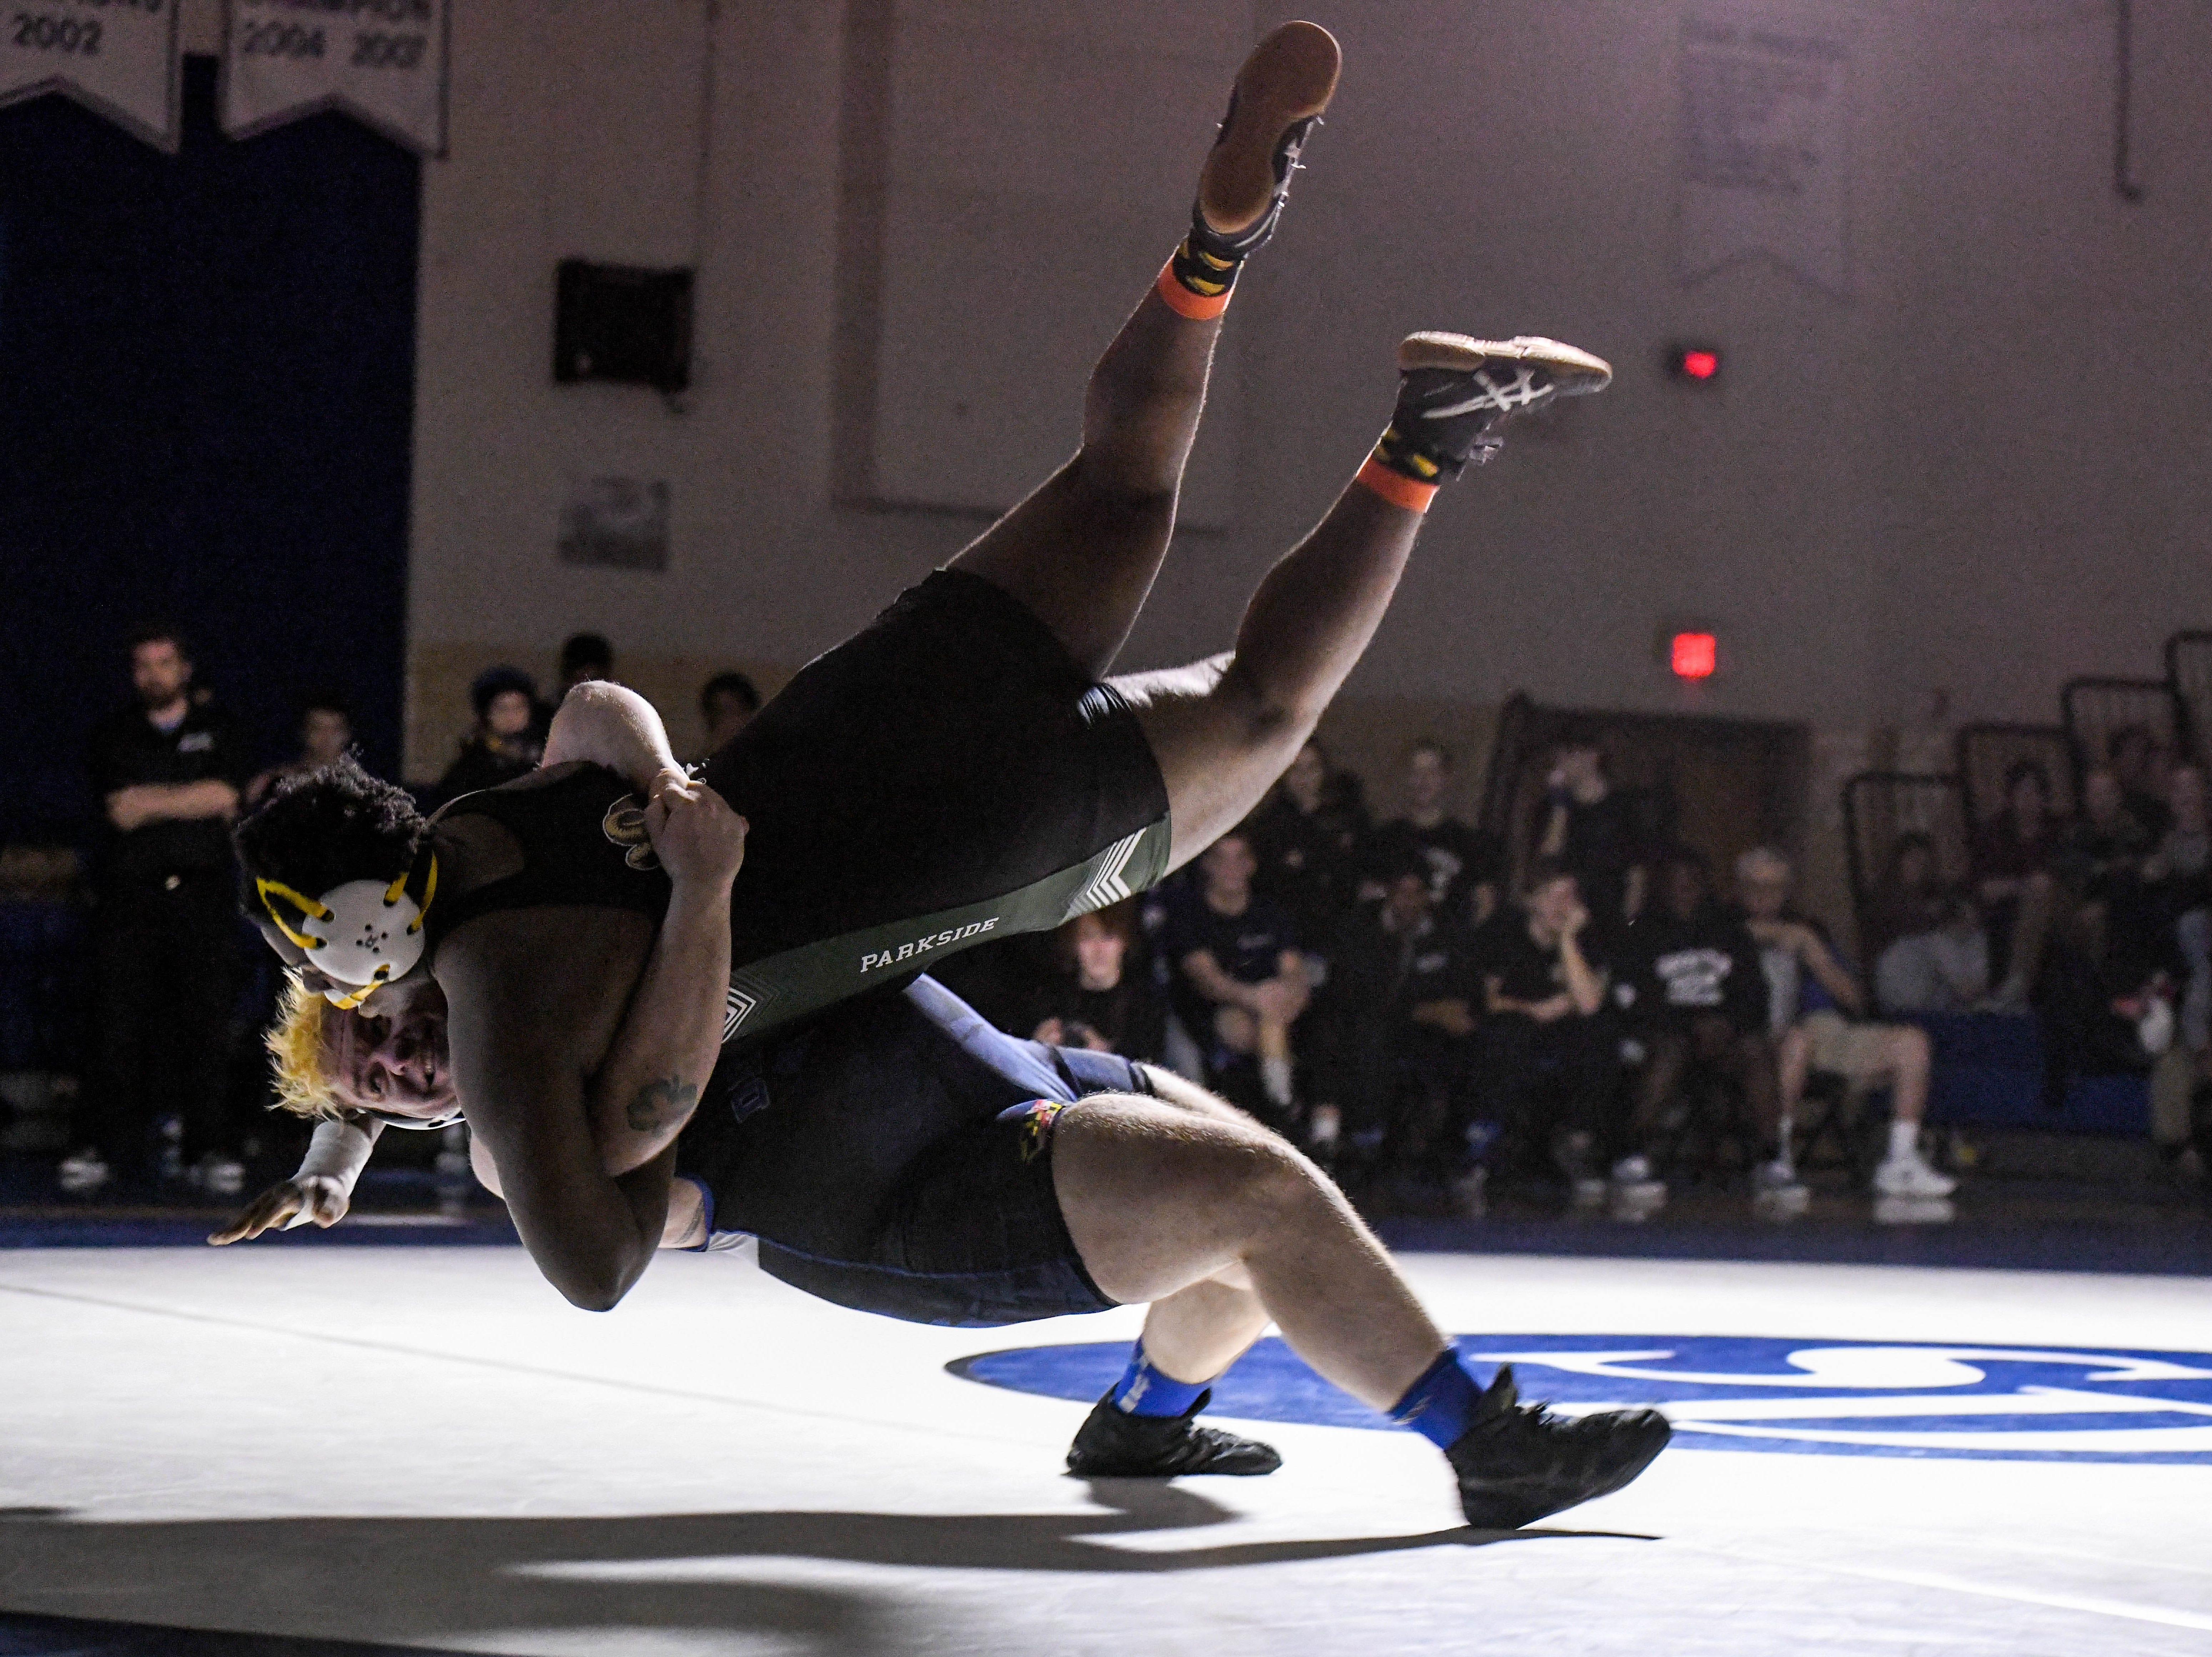 Stephen Decatur's Dakota Souder wrestles against Parkside's Mike Collins in the 285 match up at Stephen Decatur High School on Wednesday, Jan. 23, 2019.